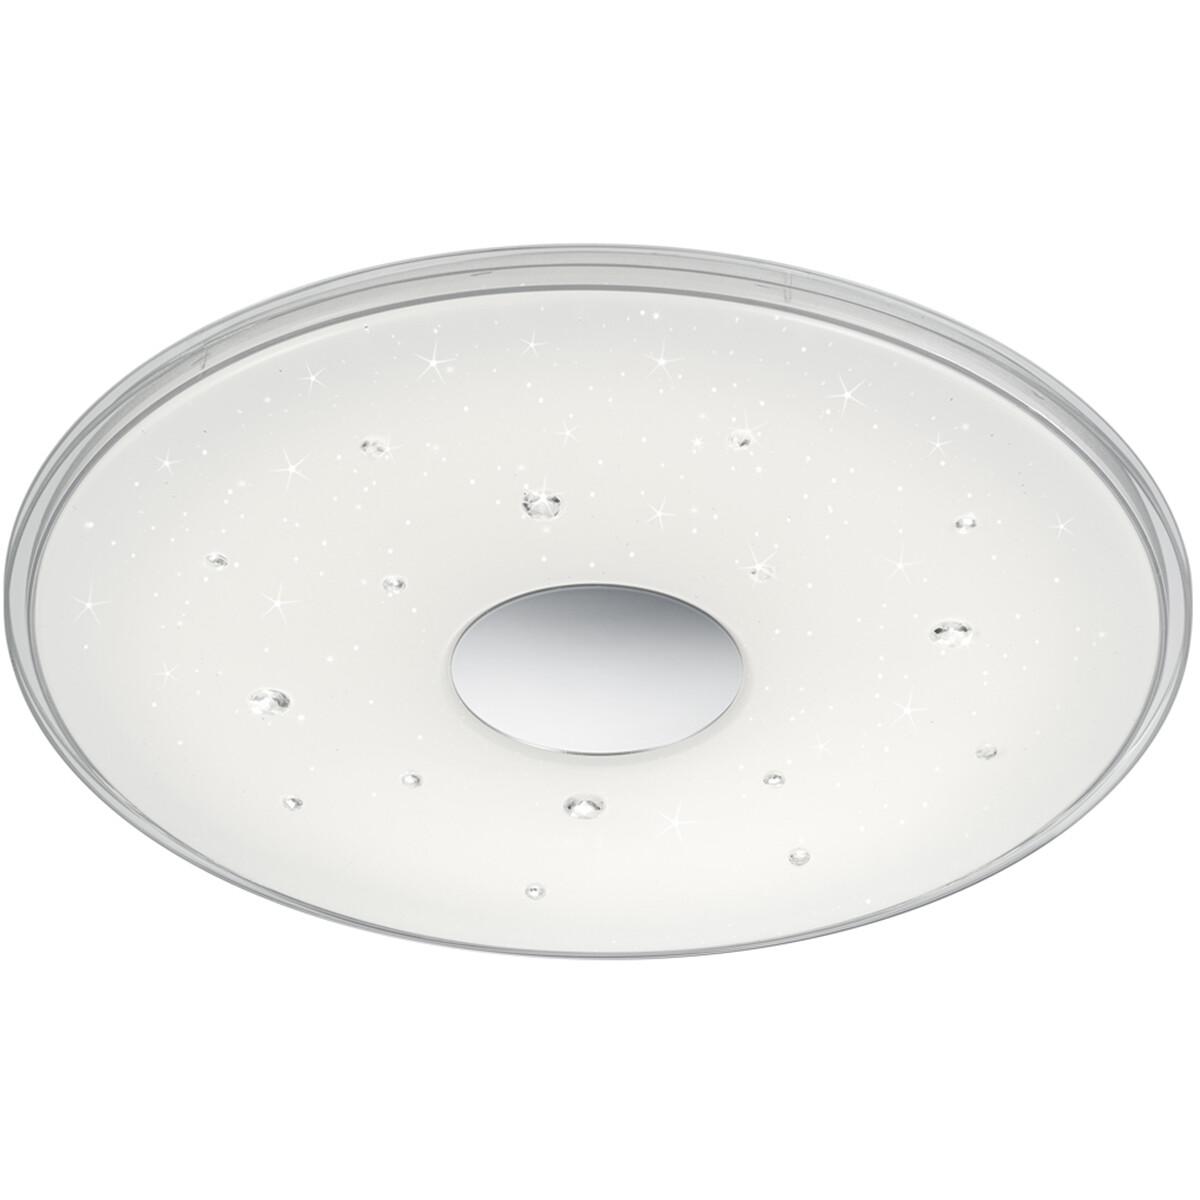 LED Plafondlamp - Trion Seykon - 30W - Aanpasbare Kleur - Dimbaar - Afstandsbediening - Sterlicht -